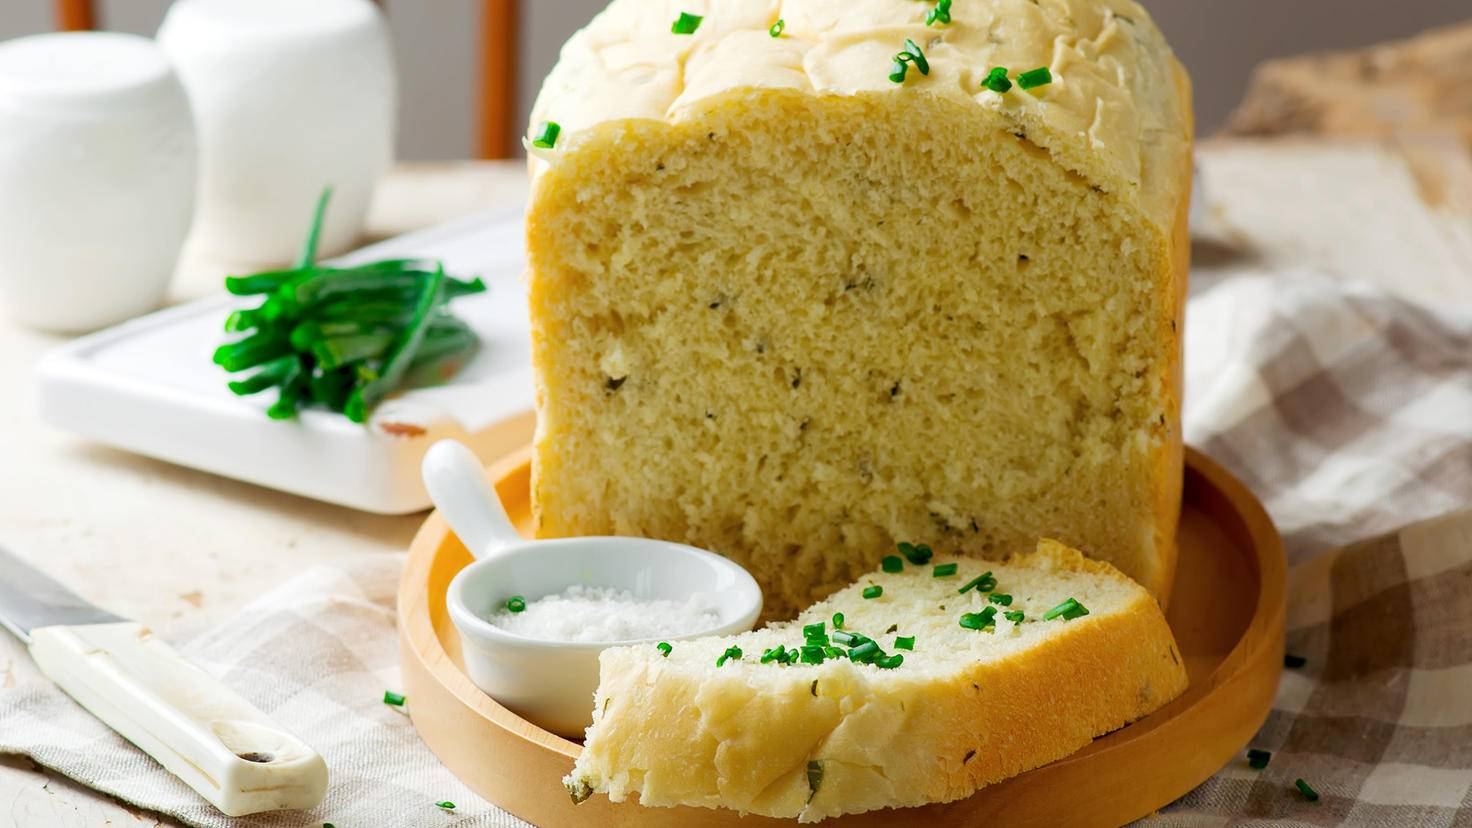 Brot-sour cream-AdobeStock-zoryanchik